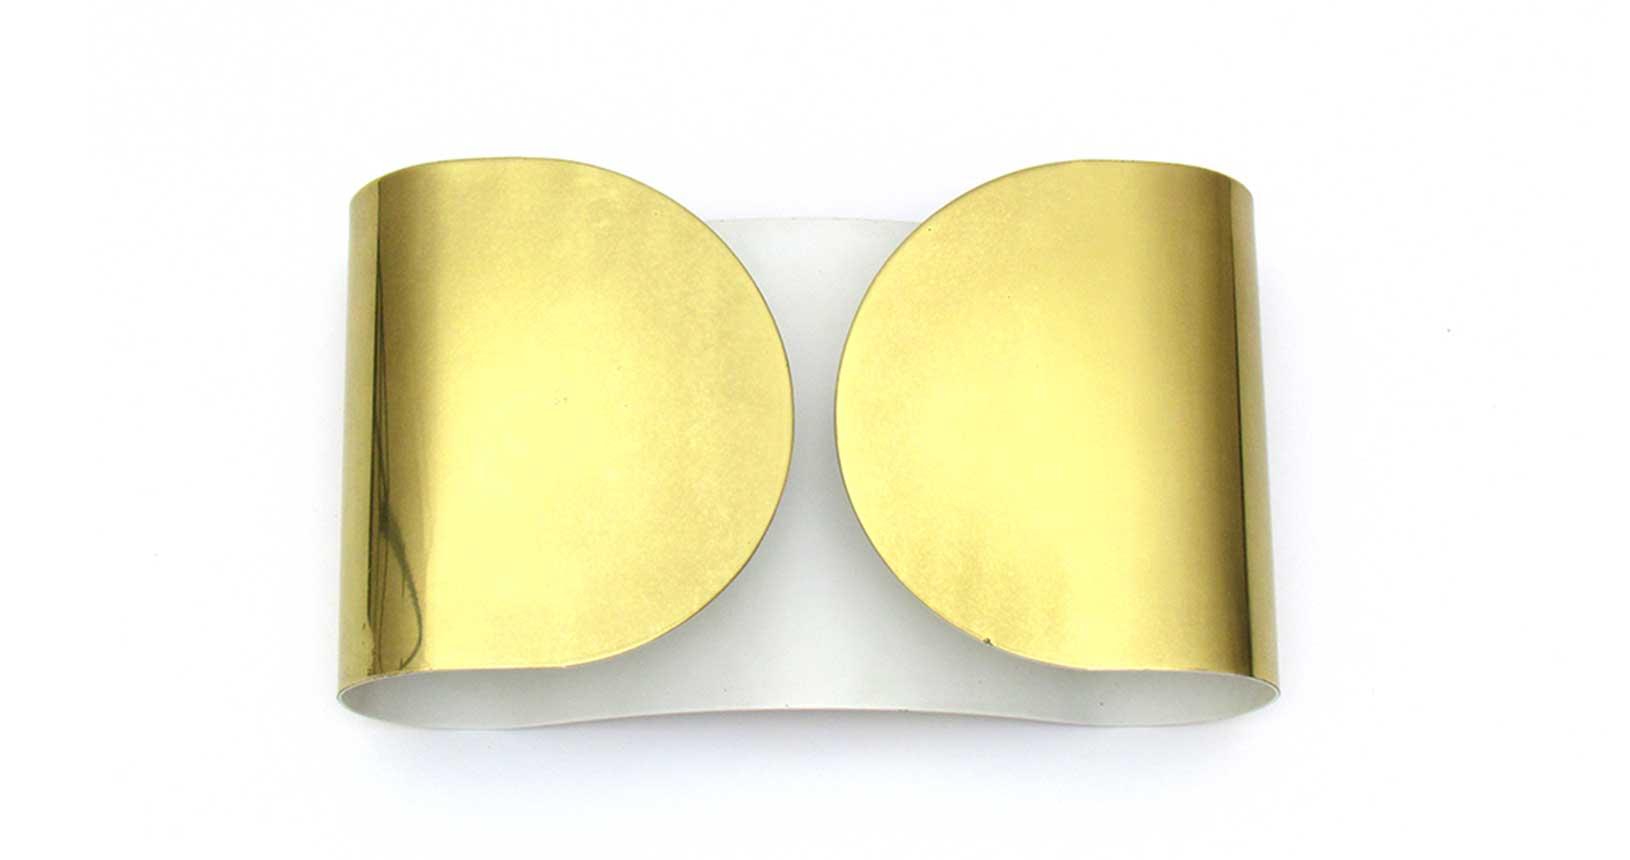 Foglio applique tobia scarpa floss gold brass wall lamp vintage design iconic design